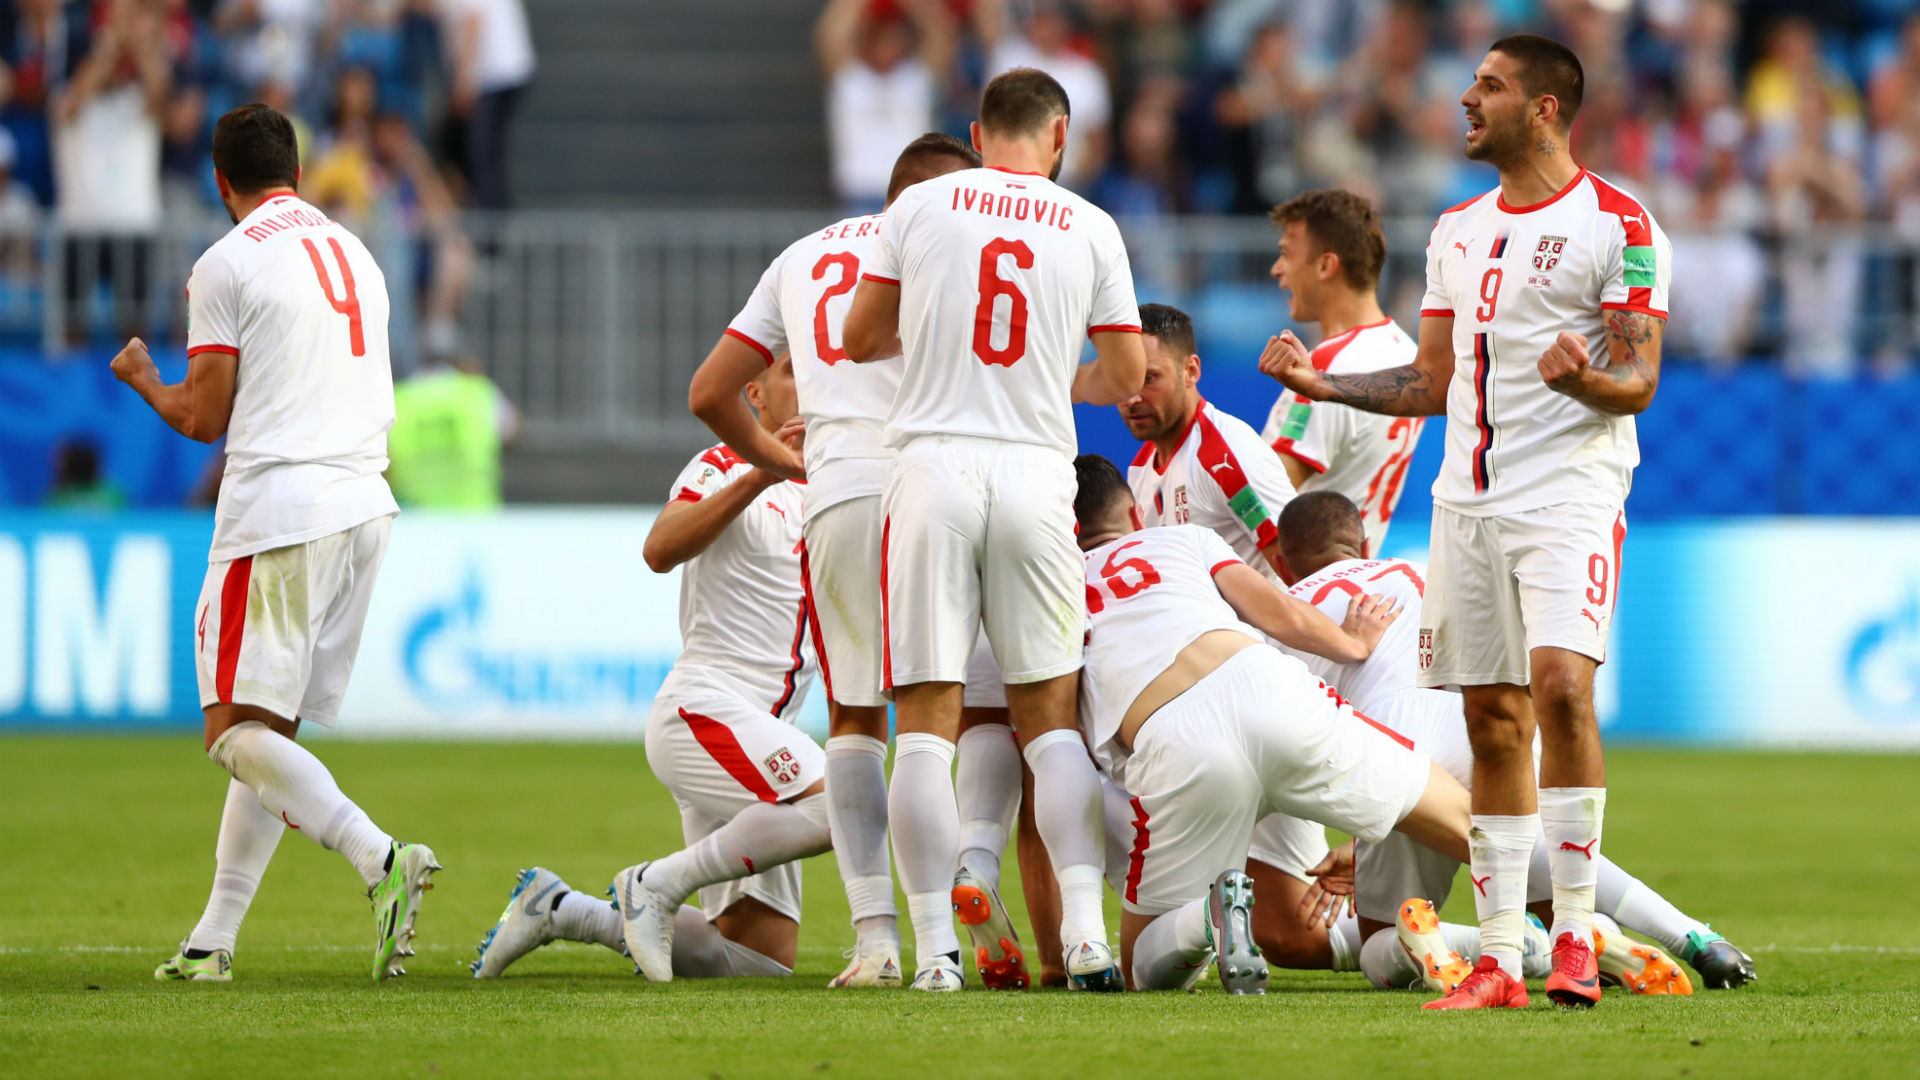 World Cup 2018: Costa Rica, Serbia serve up spectacle in sunny Samara